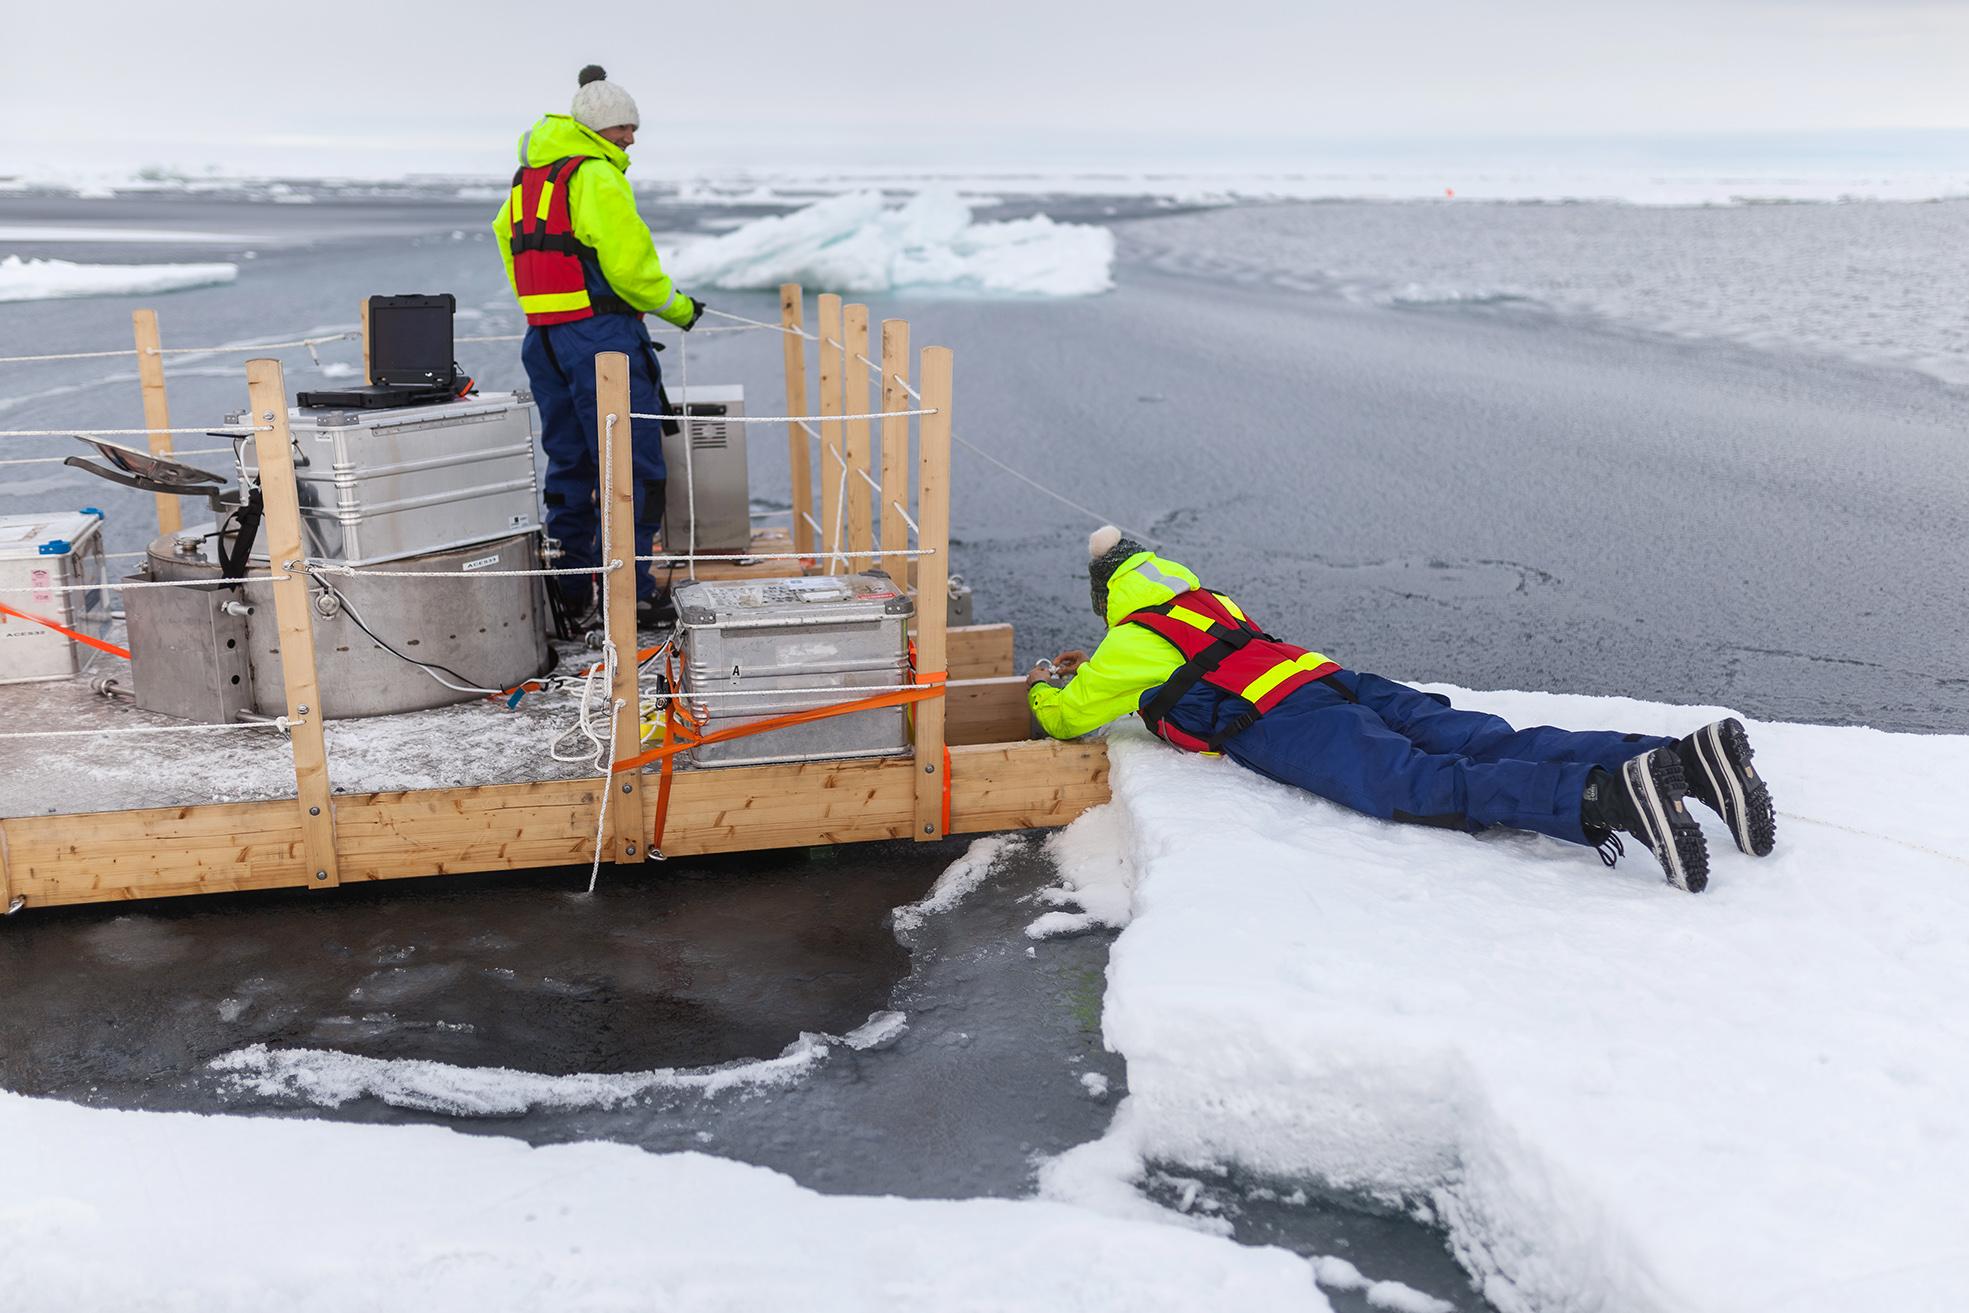 Matt Salter and Helen Czerski setting mooring lines for the floating aerosol chamber. Photo: Mario Hoppman